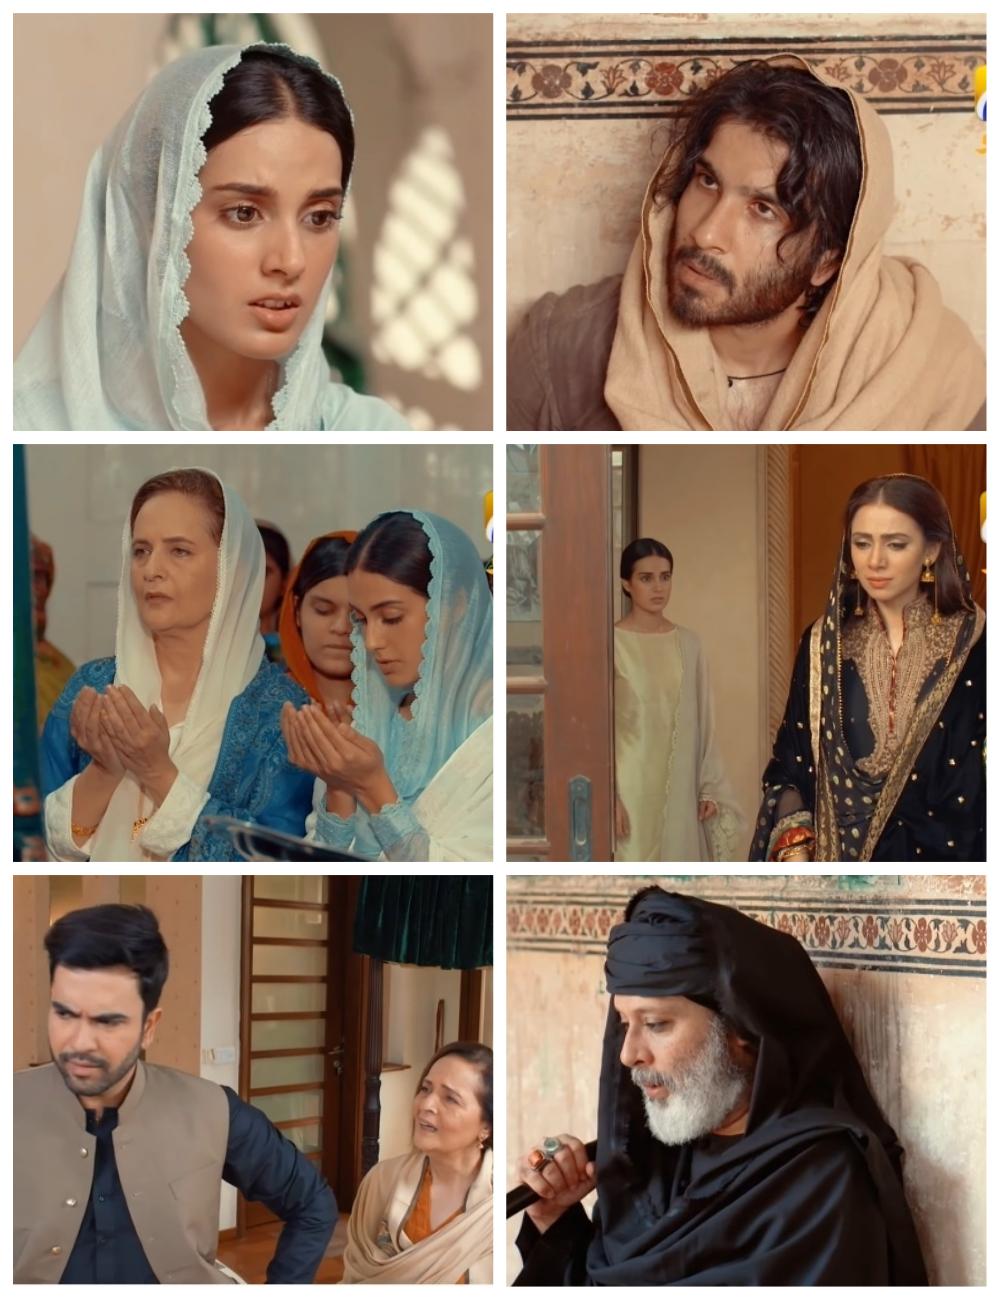 Khuda Aur Mohabbat 3 Episode 26 Story Review - Mahi The Savior